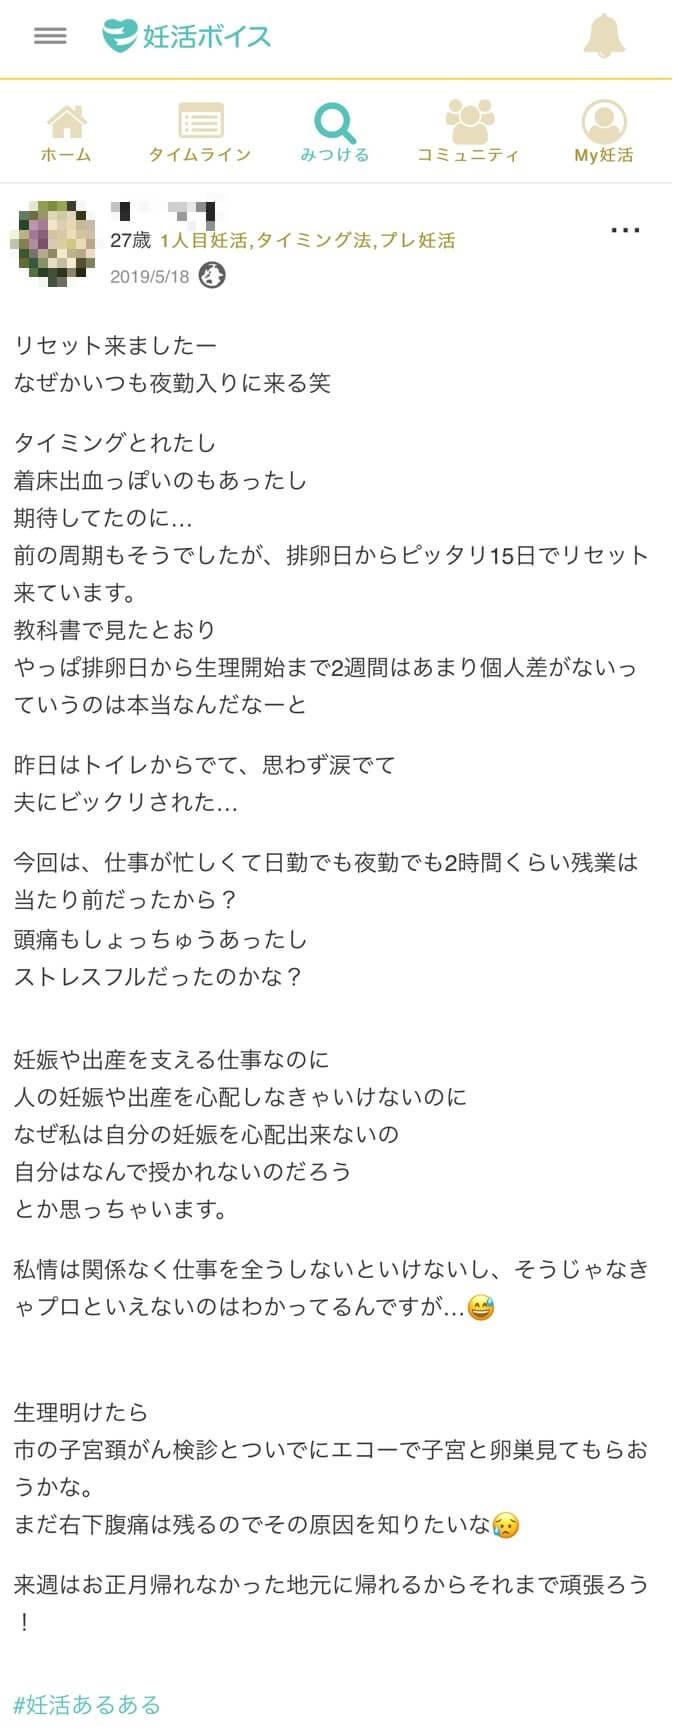 Eさん(27歳・1人目妊活・タイミング法・プレ妊活)